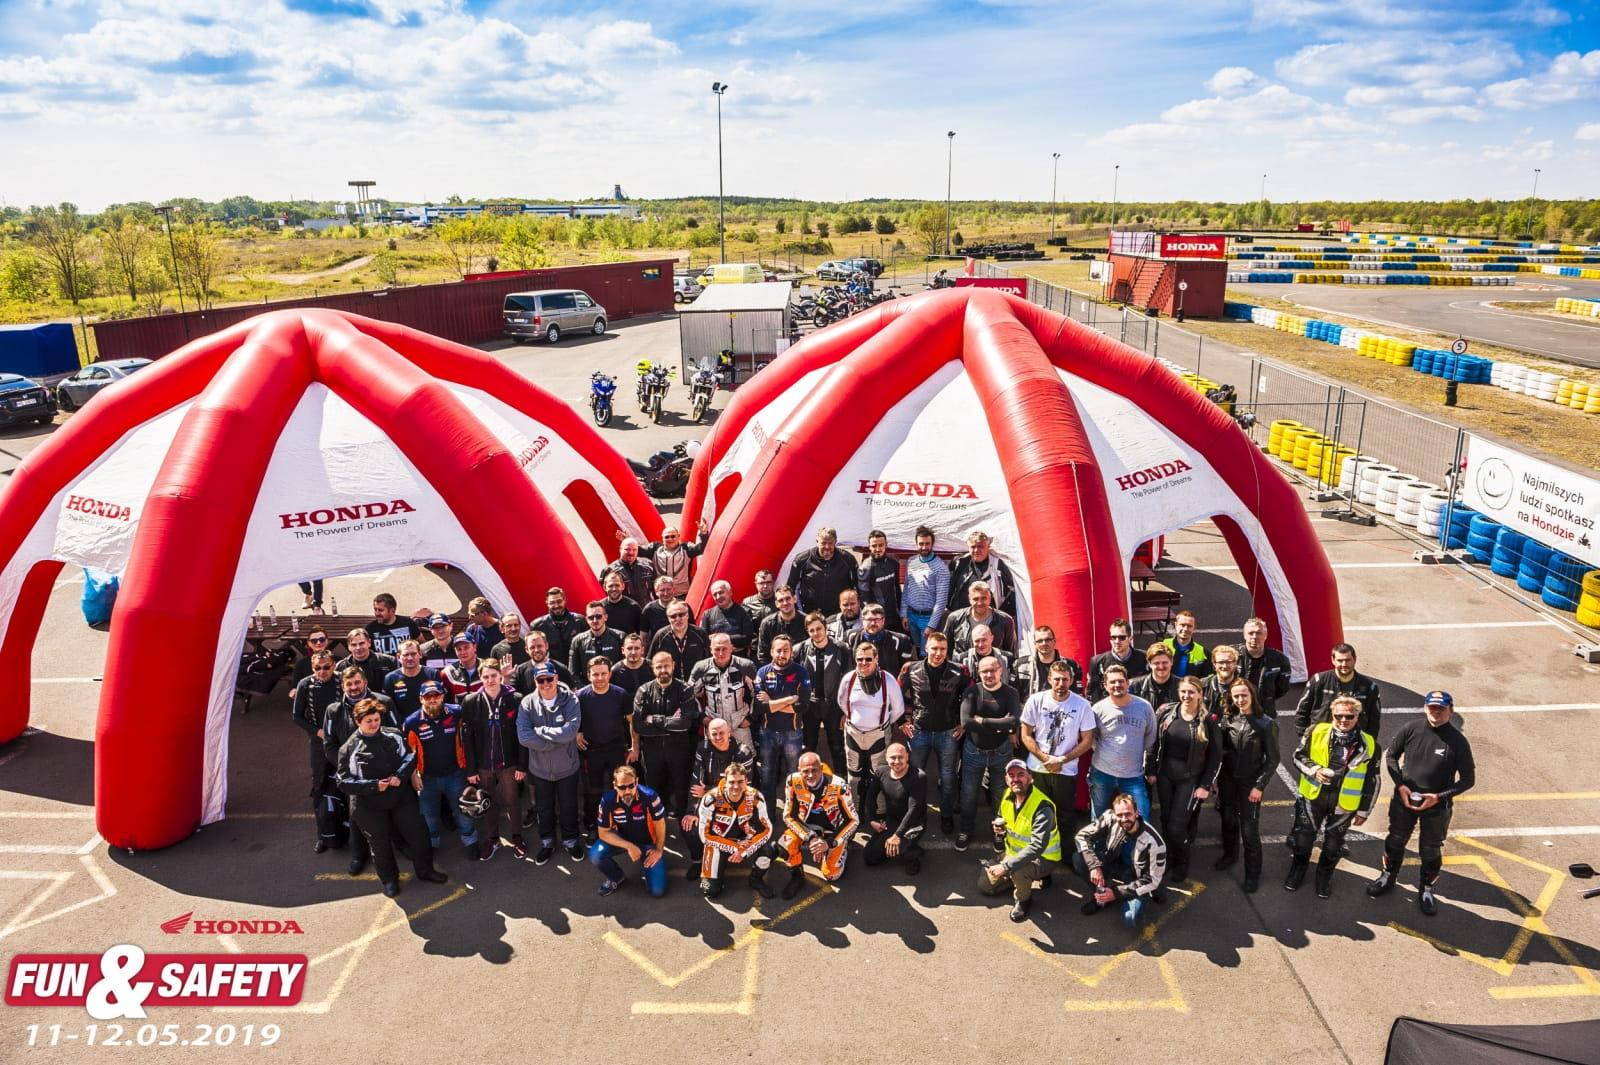 Honda Fun&Safety 2019 wideo